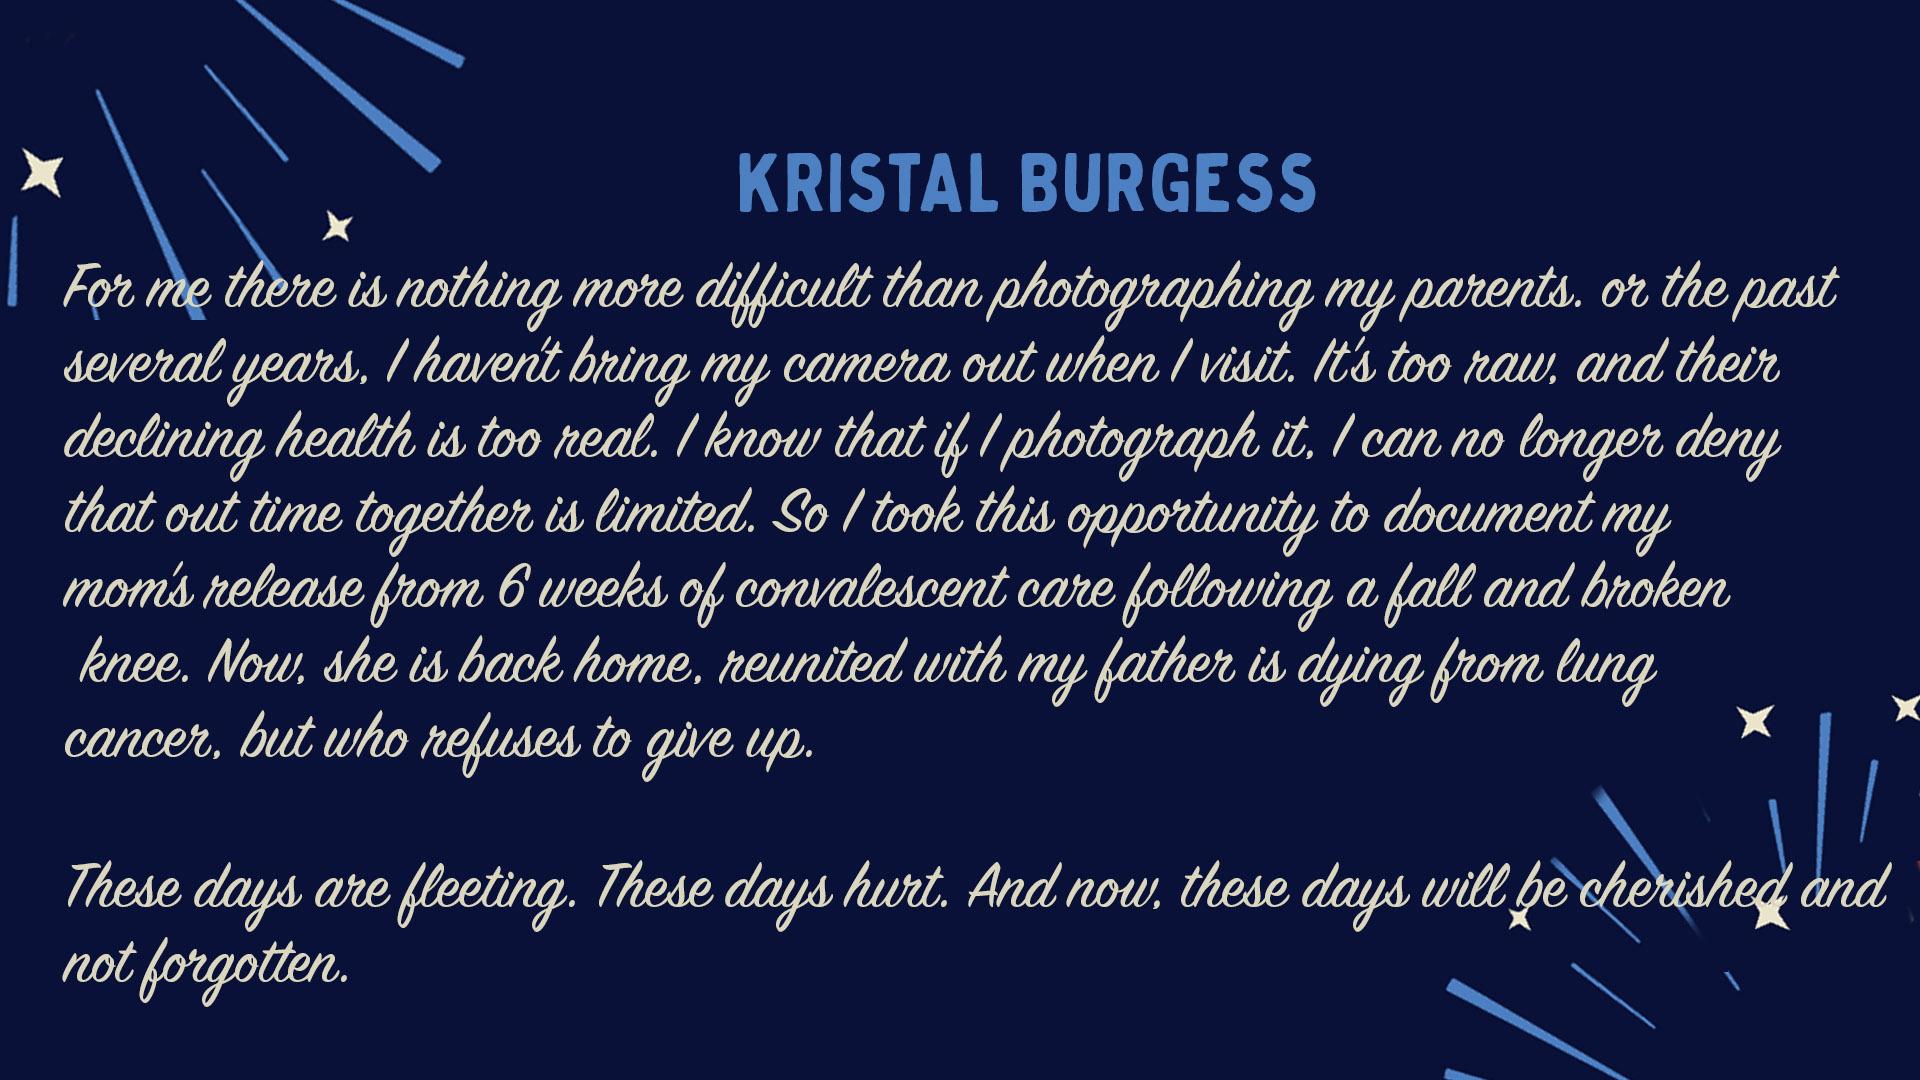 Kristal Burgess - Artist Statement